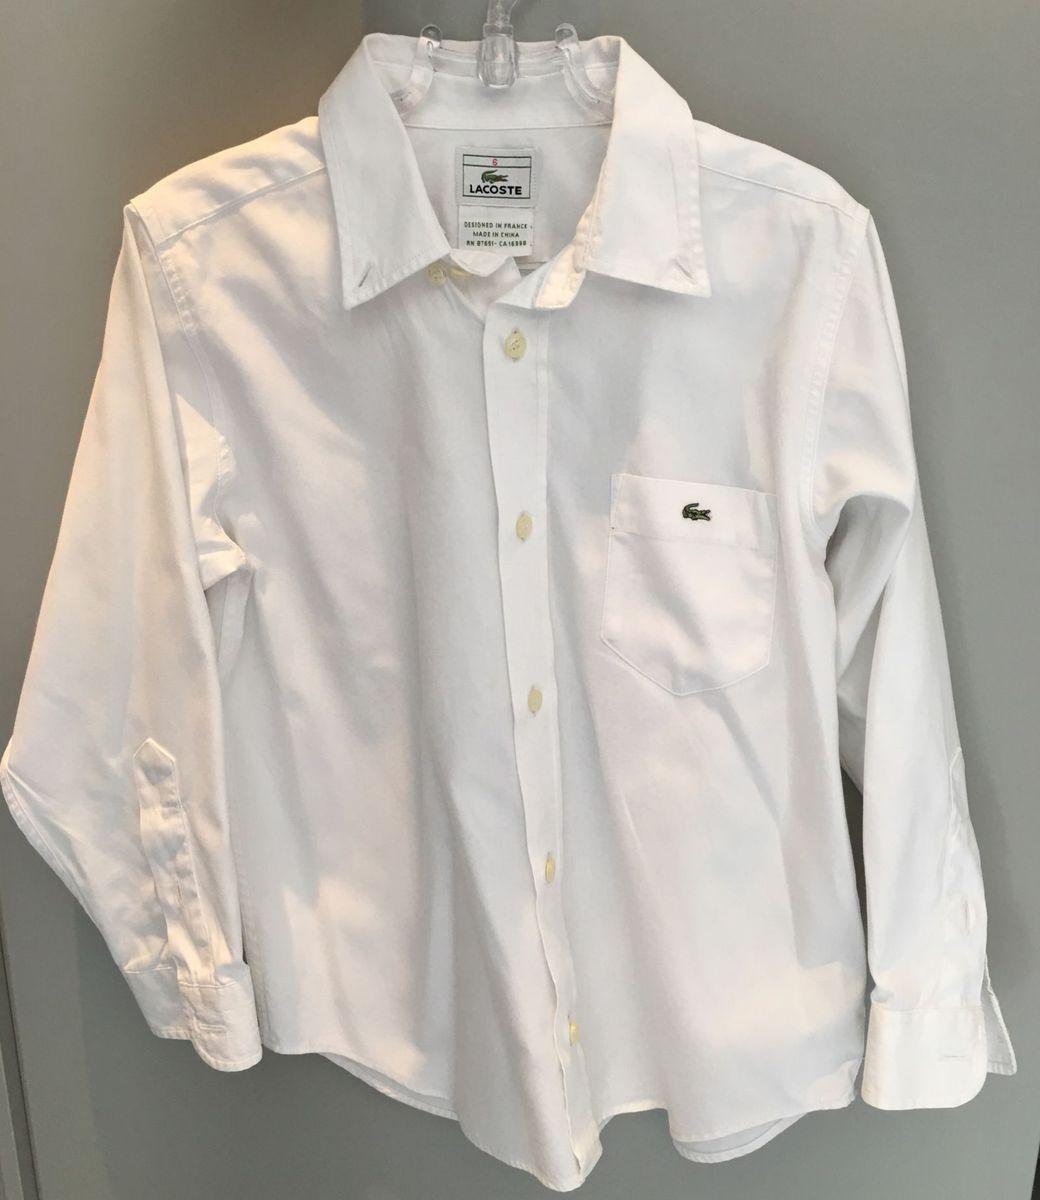 33957302e45bc camisa social lacoste original tam 6 anos - menino lacoste